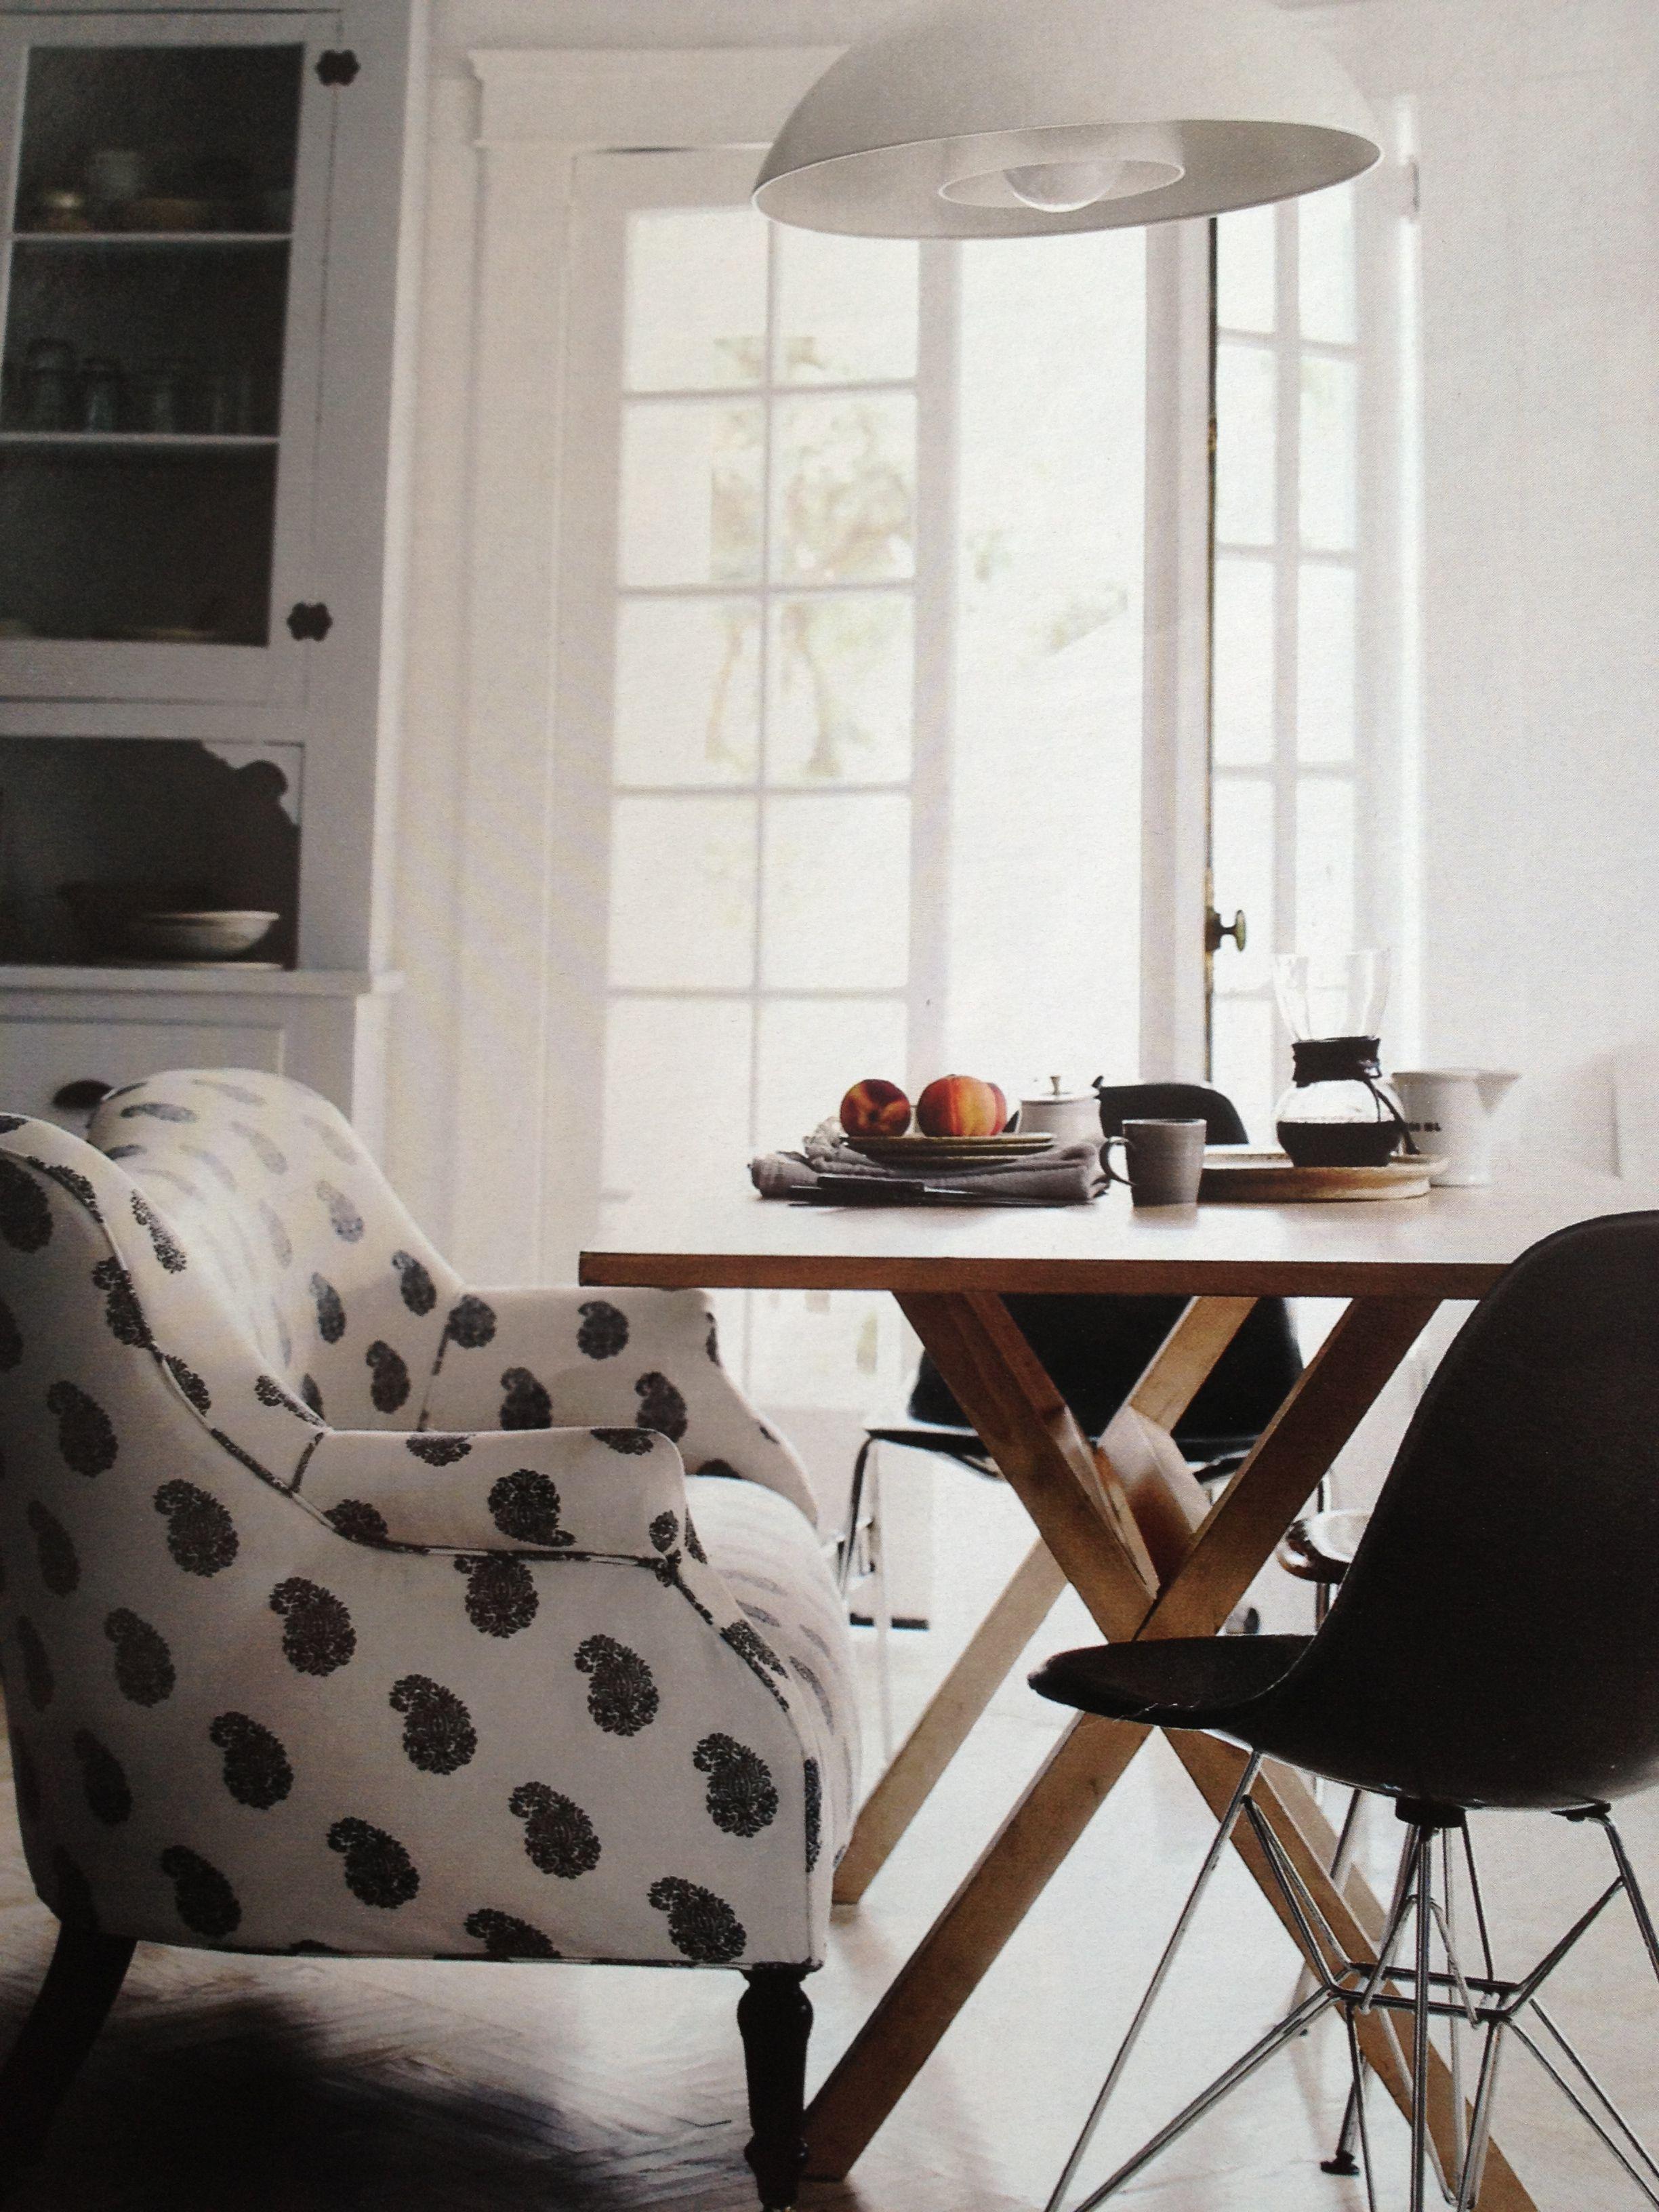 Martha Stewart living   Modern wicker furniture, Furniture ... on Martha Living Wicker Patio Set id=89512